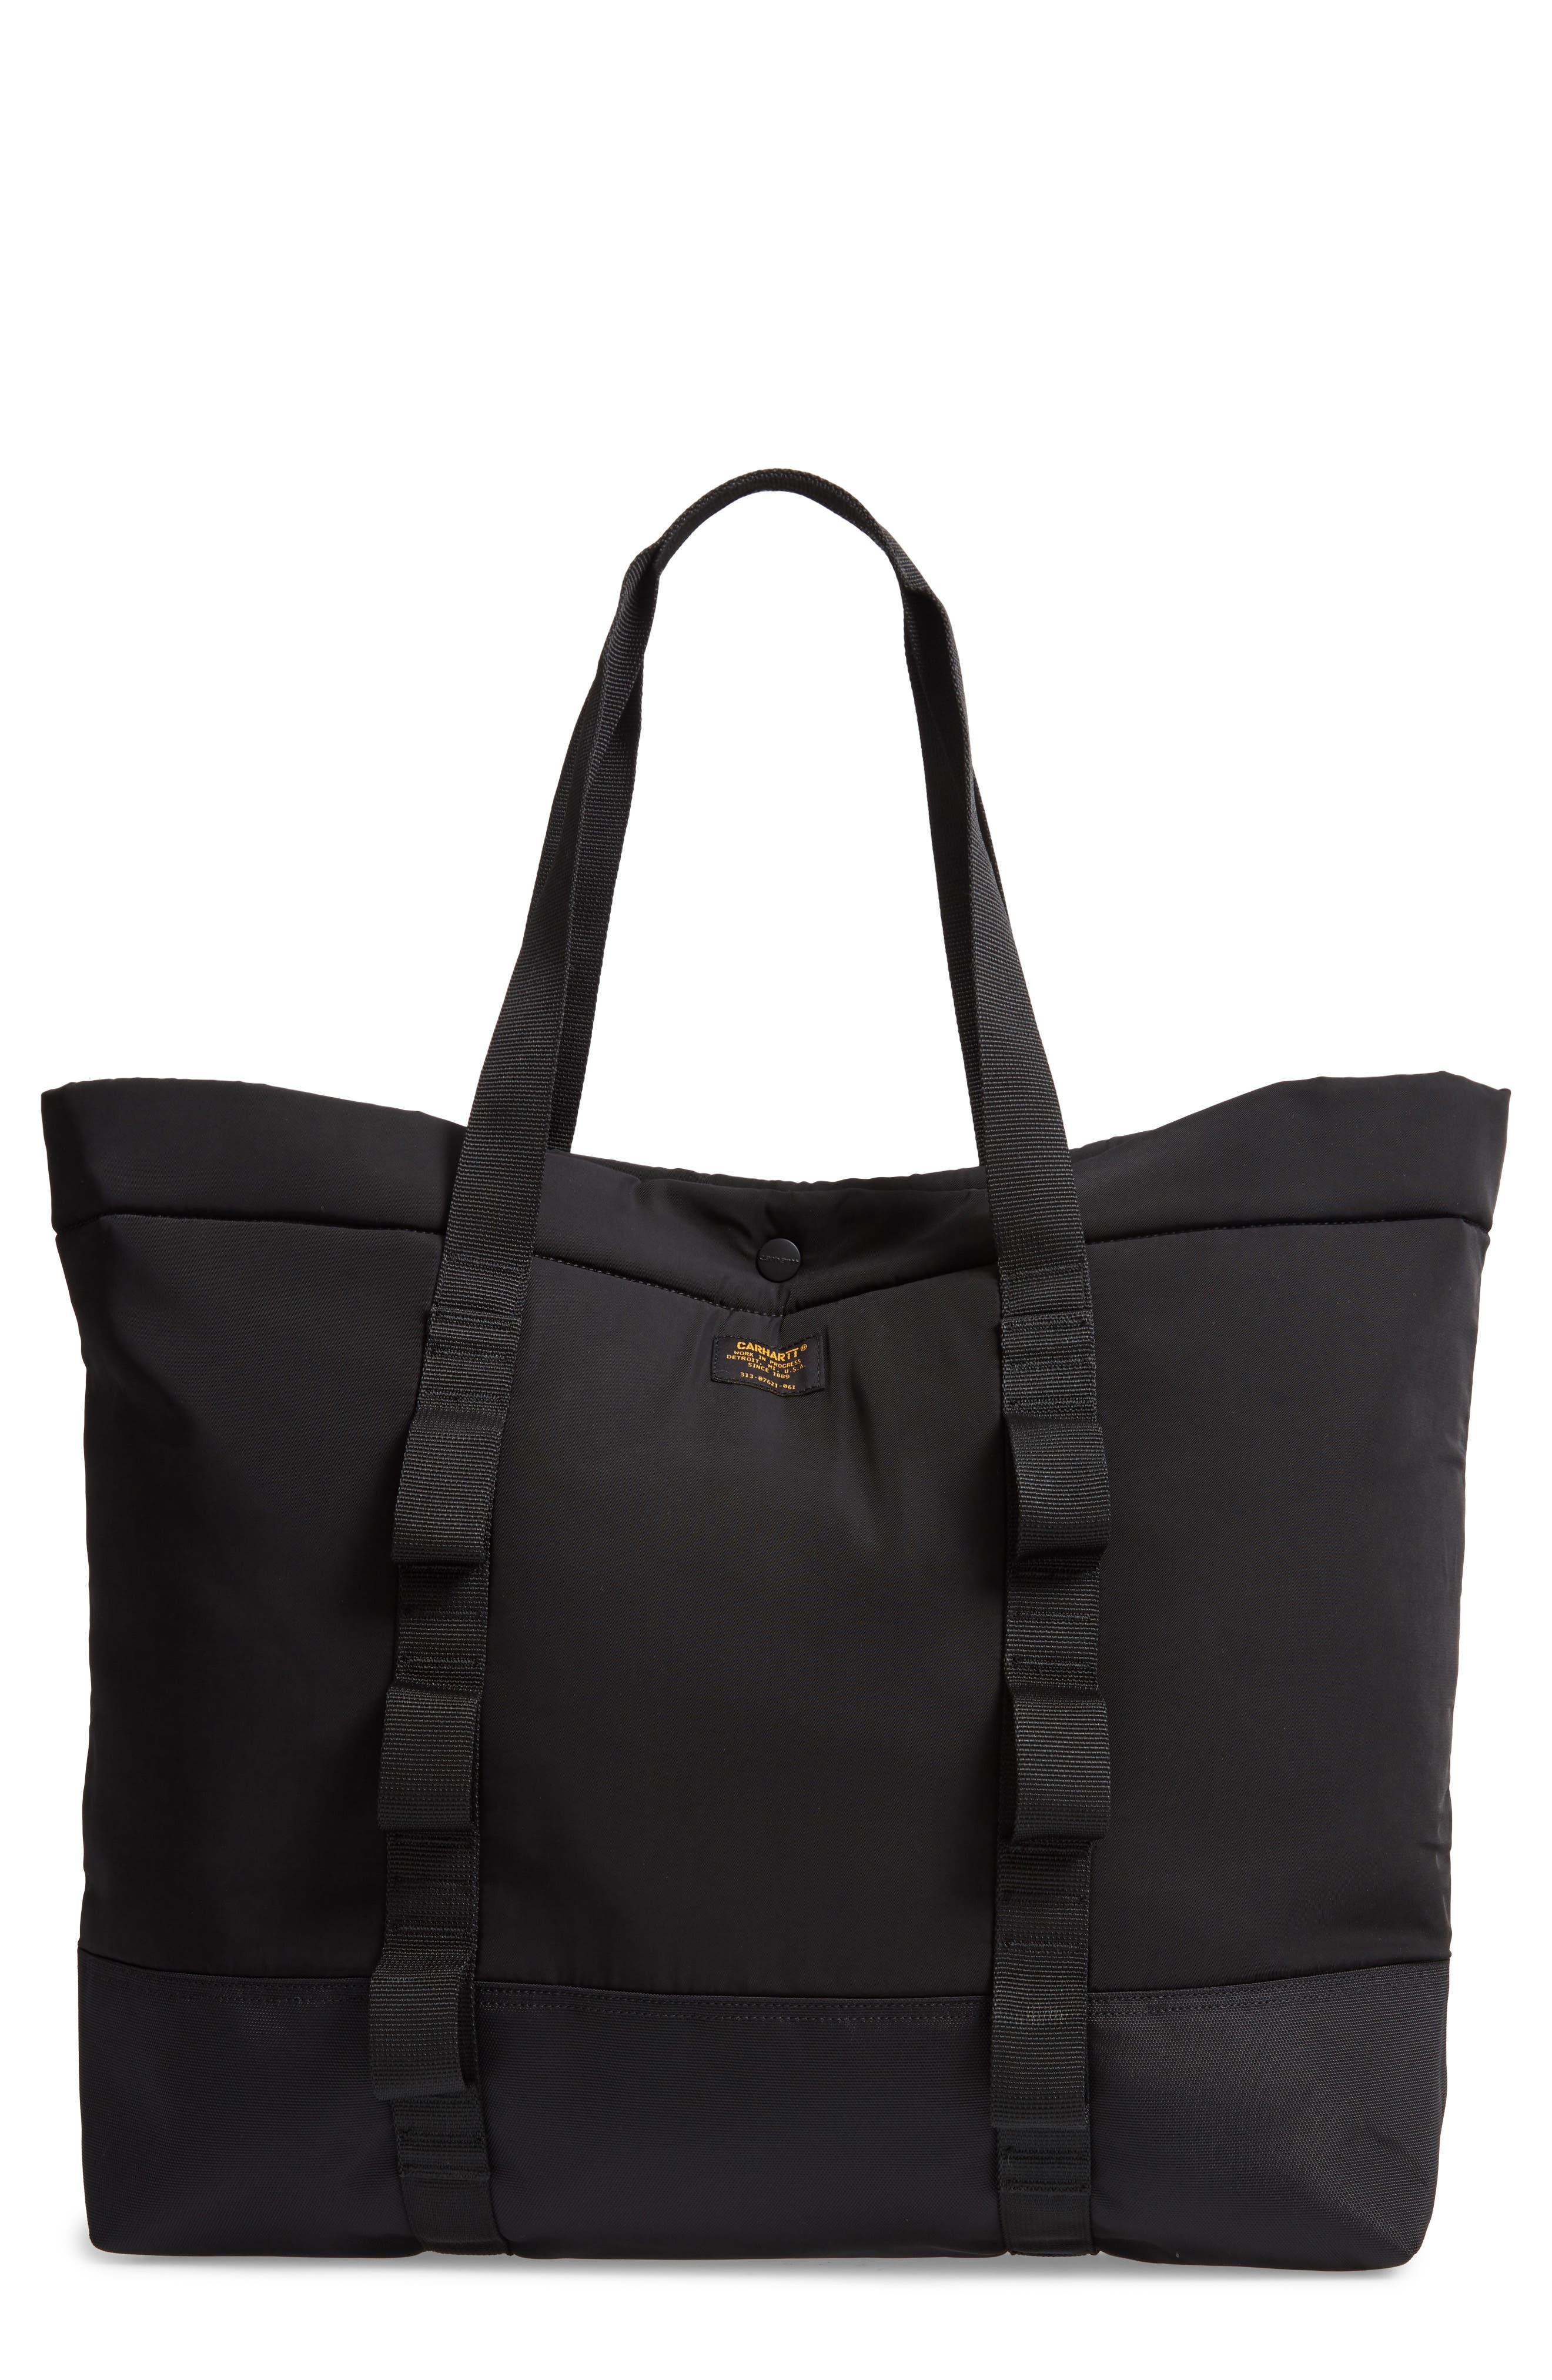 Military Shopper Tote Bag,                             Main thumbnail 1, color,                             001